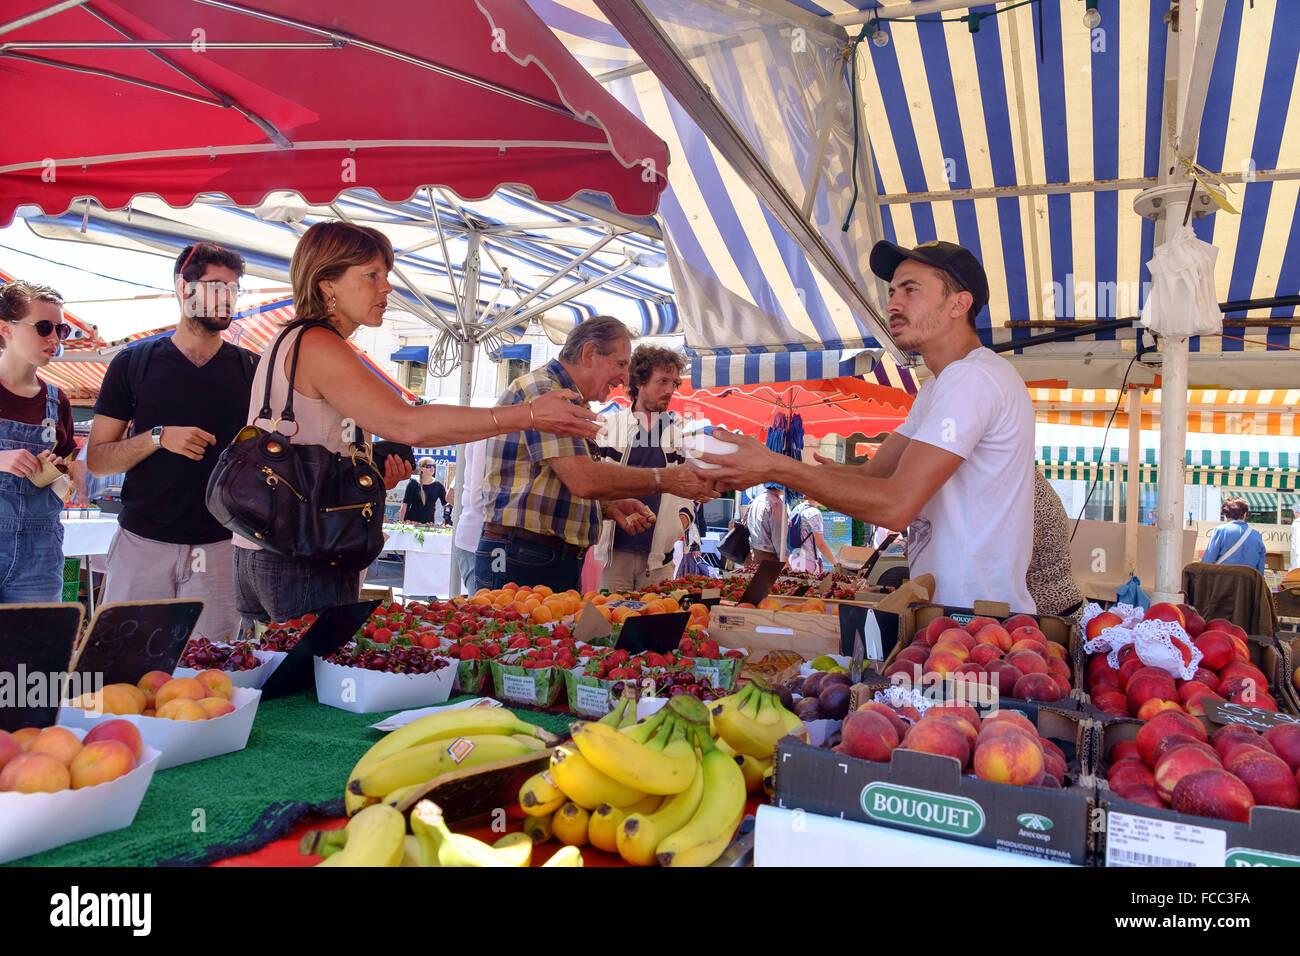 Les gens qui achètent leurs fruits street market stall france Photo Stock